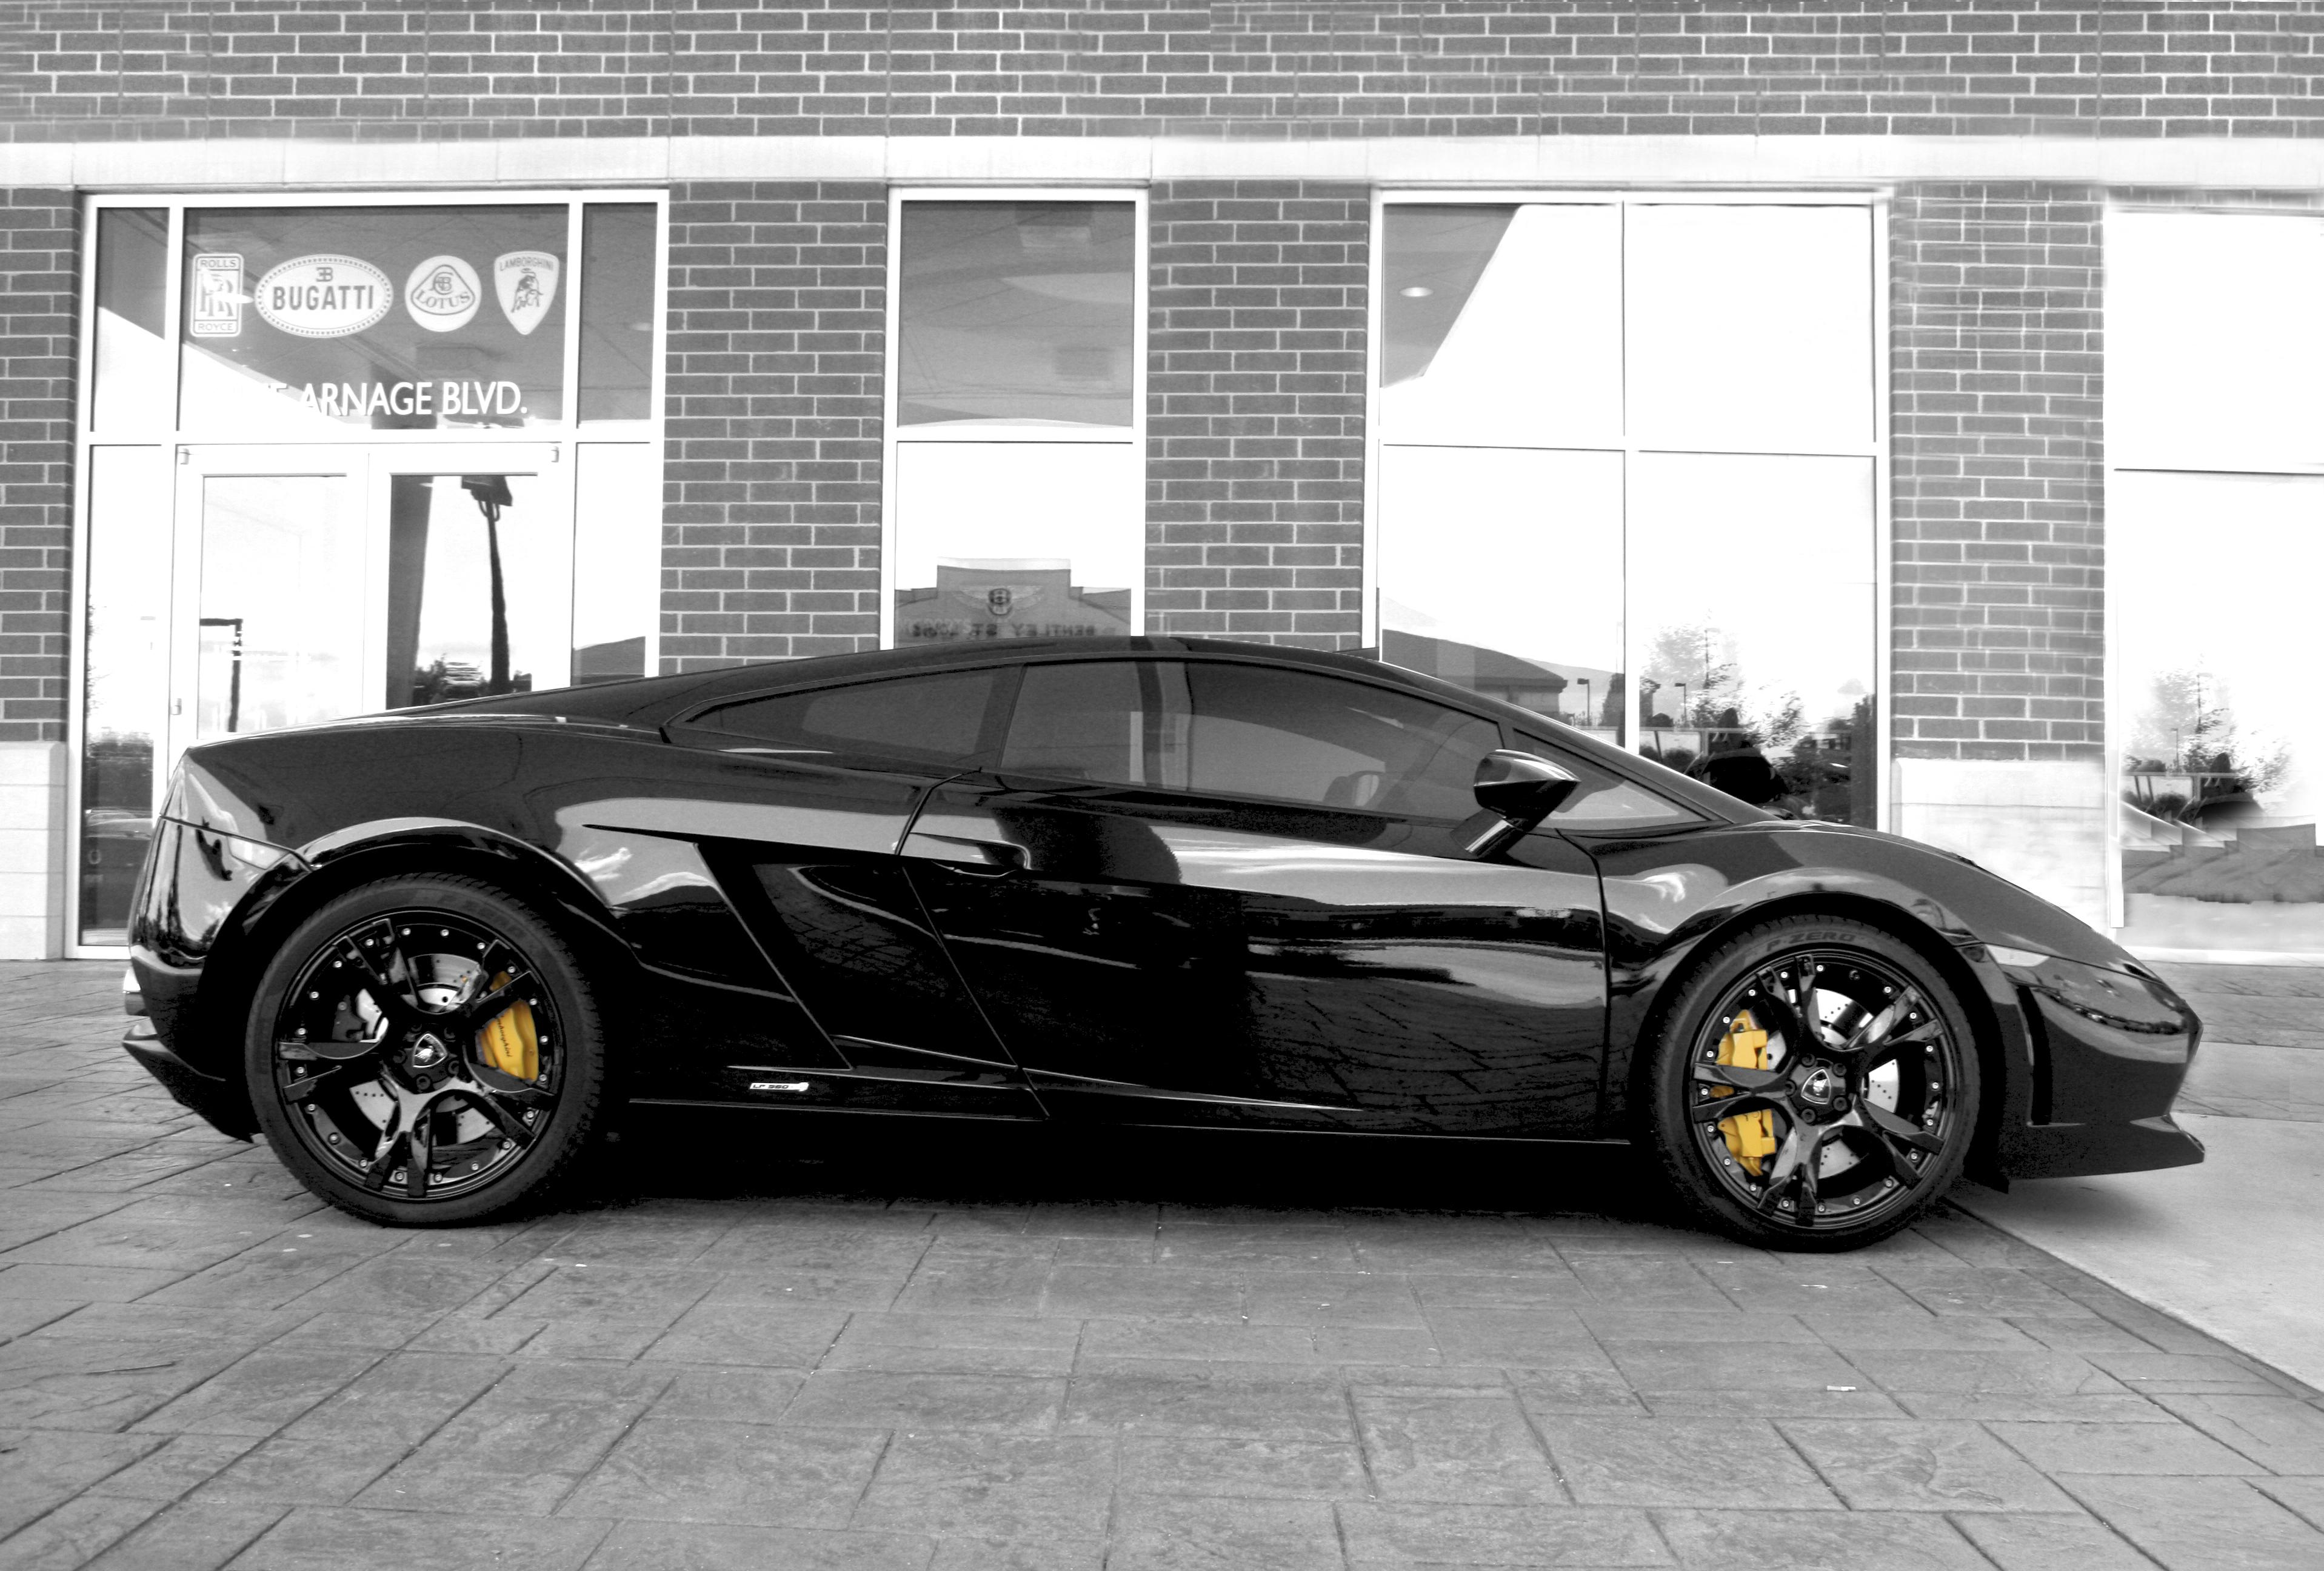 Bakgrundsbilder Svart Profil Gul Kaffe Lamborghini Aventador